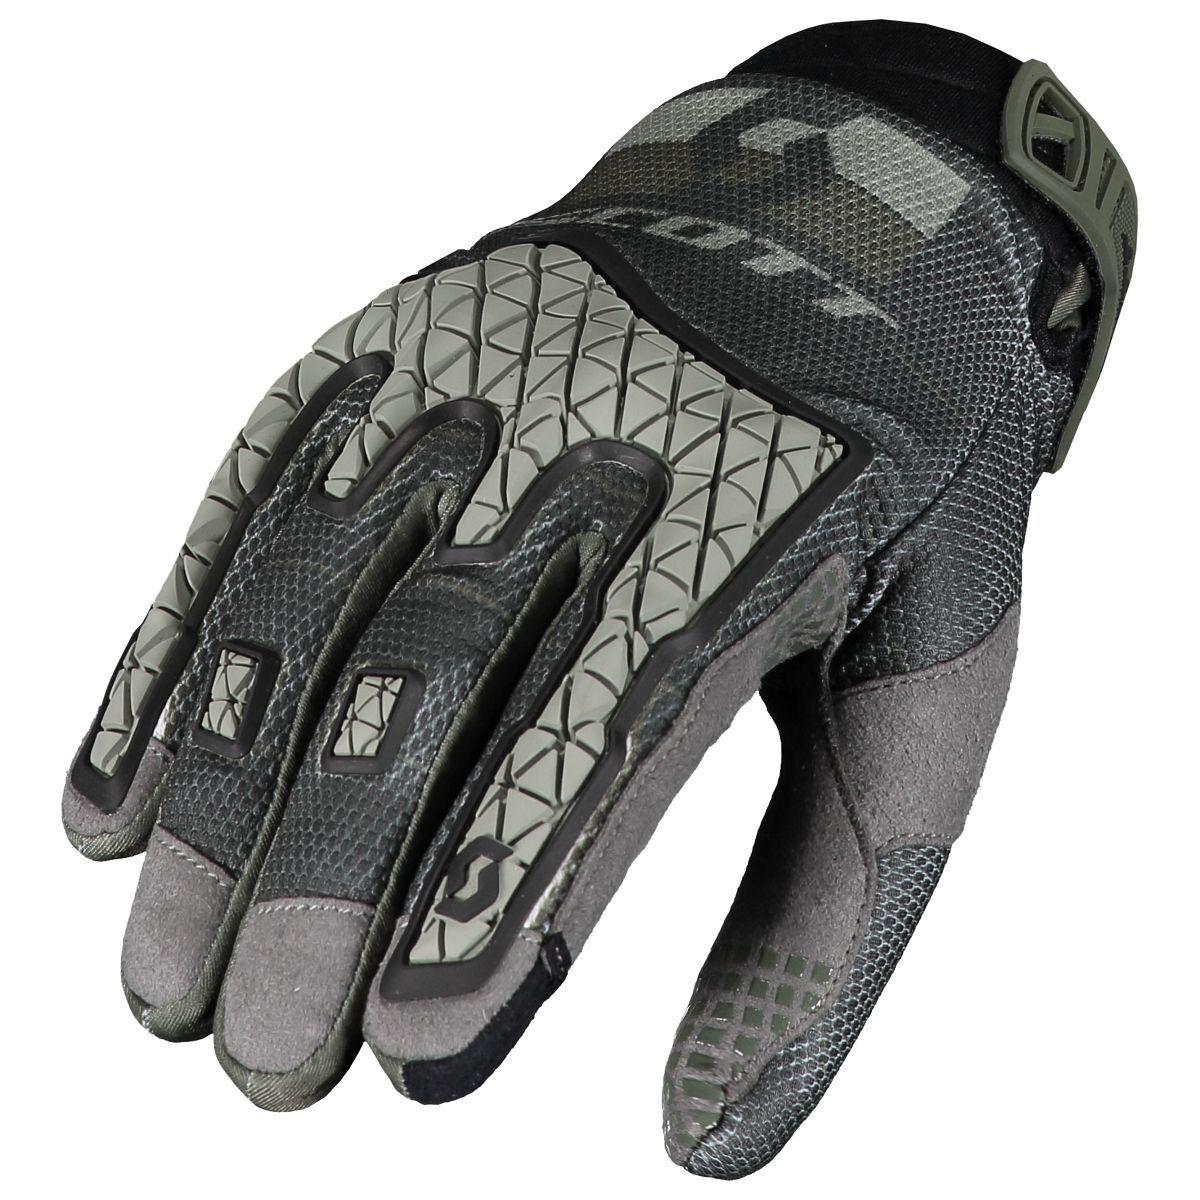 Scott Enduro MX DH Motorrad   Fahrrad Handschuhe grau 2019